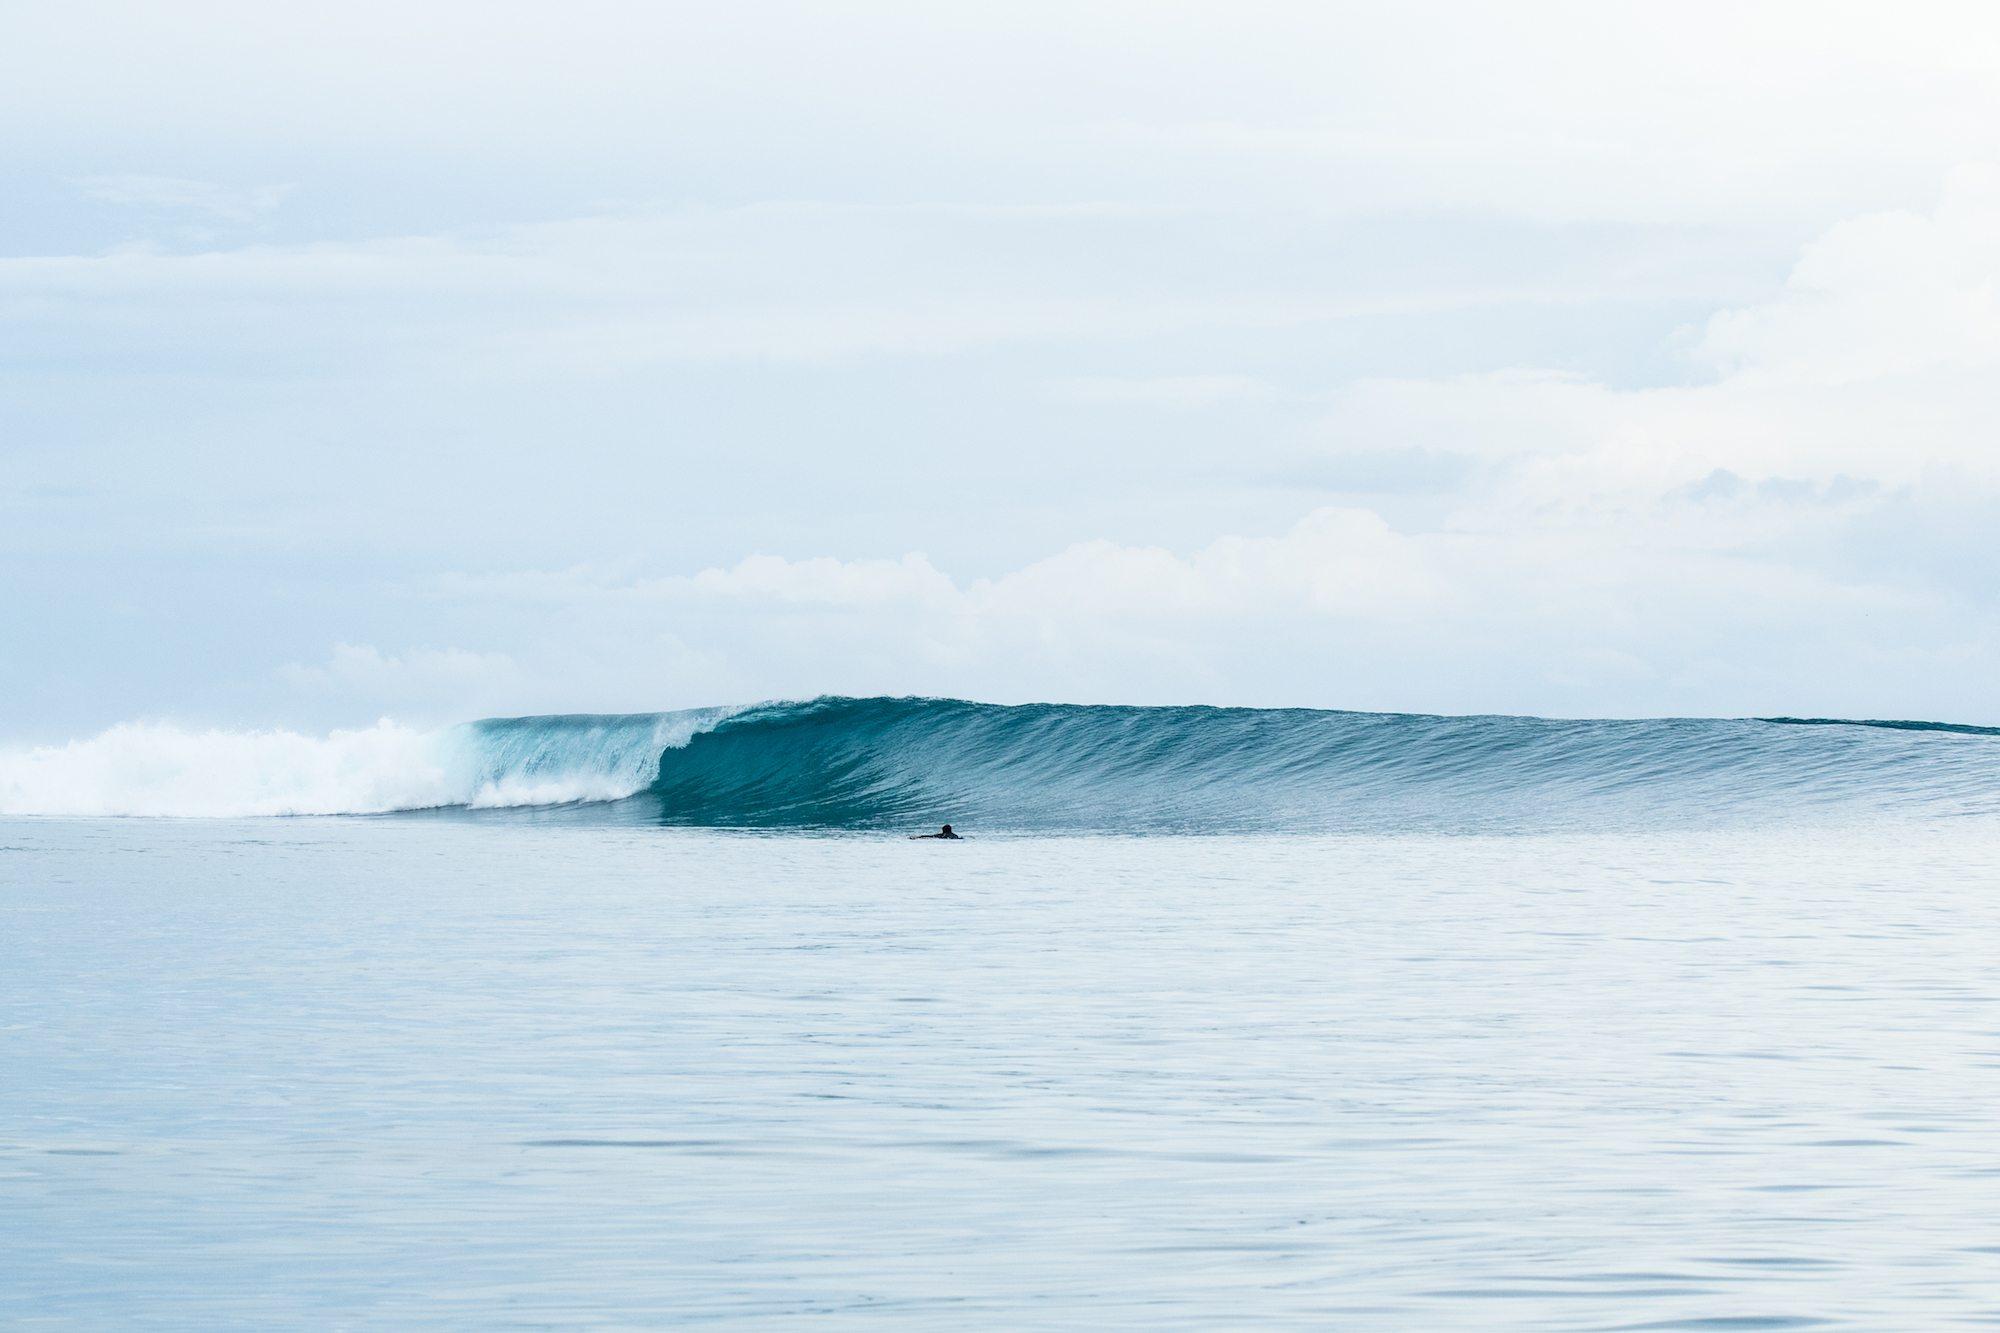 very nice plunging wave, surf banyak